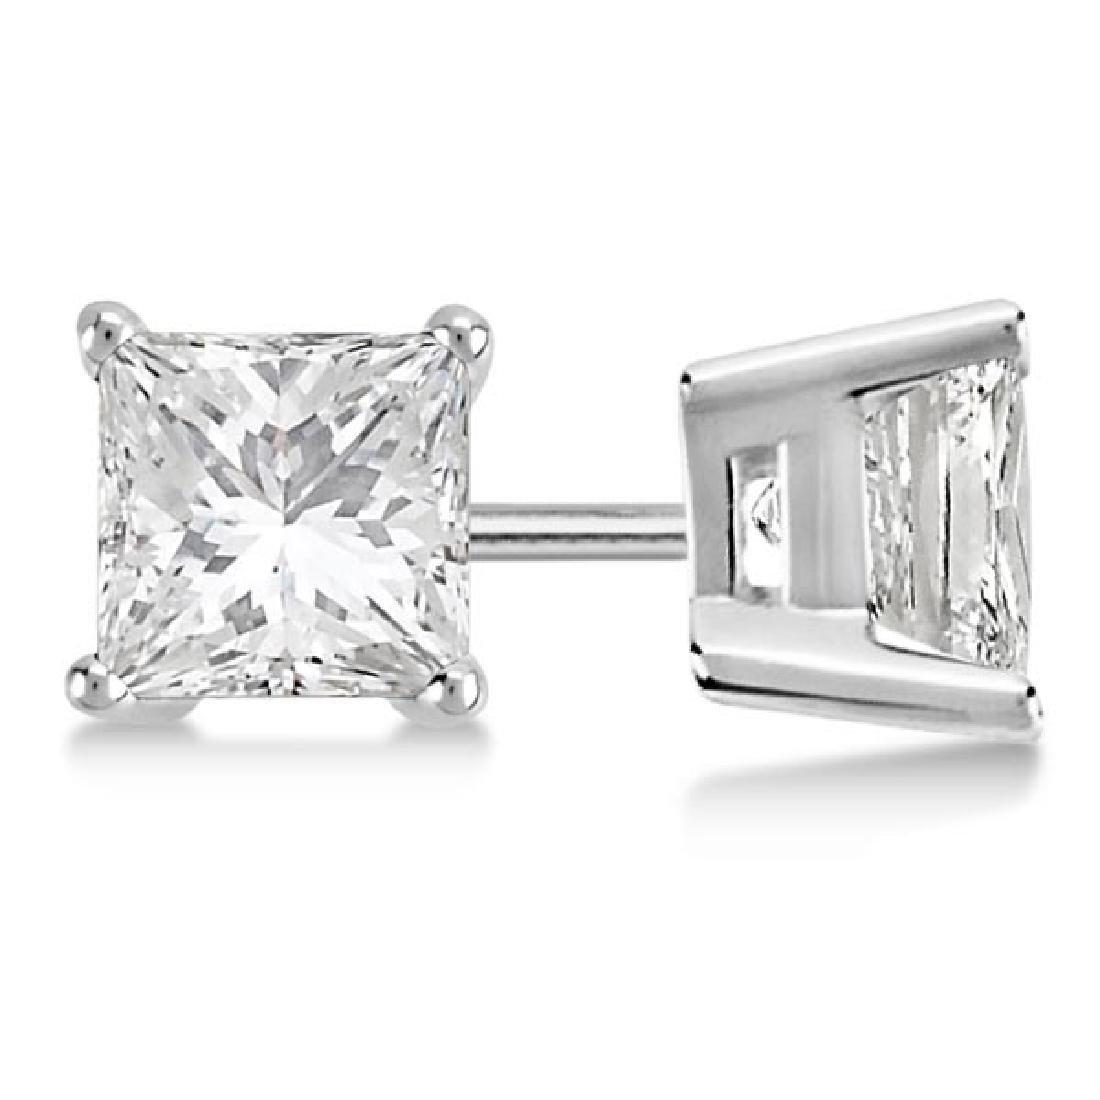 Certified 1.02 CTW Princess Diamond Stud Earrings H/SI1